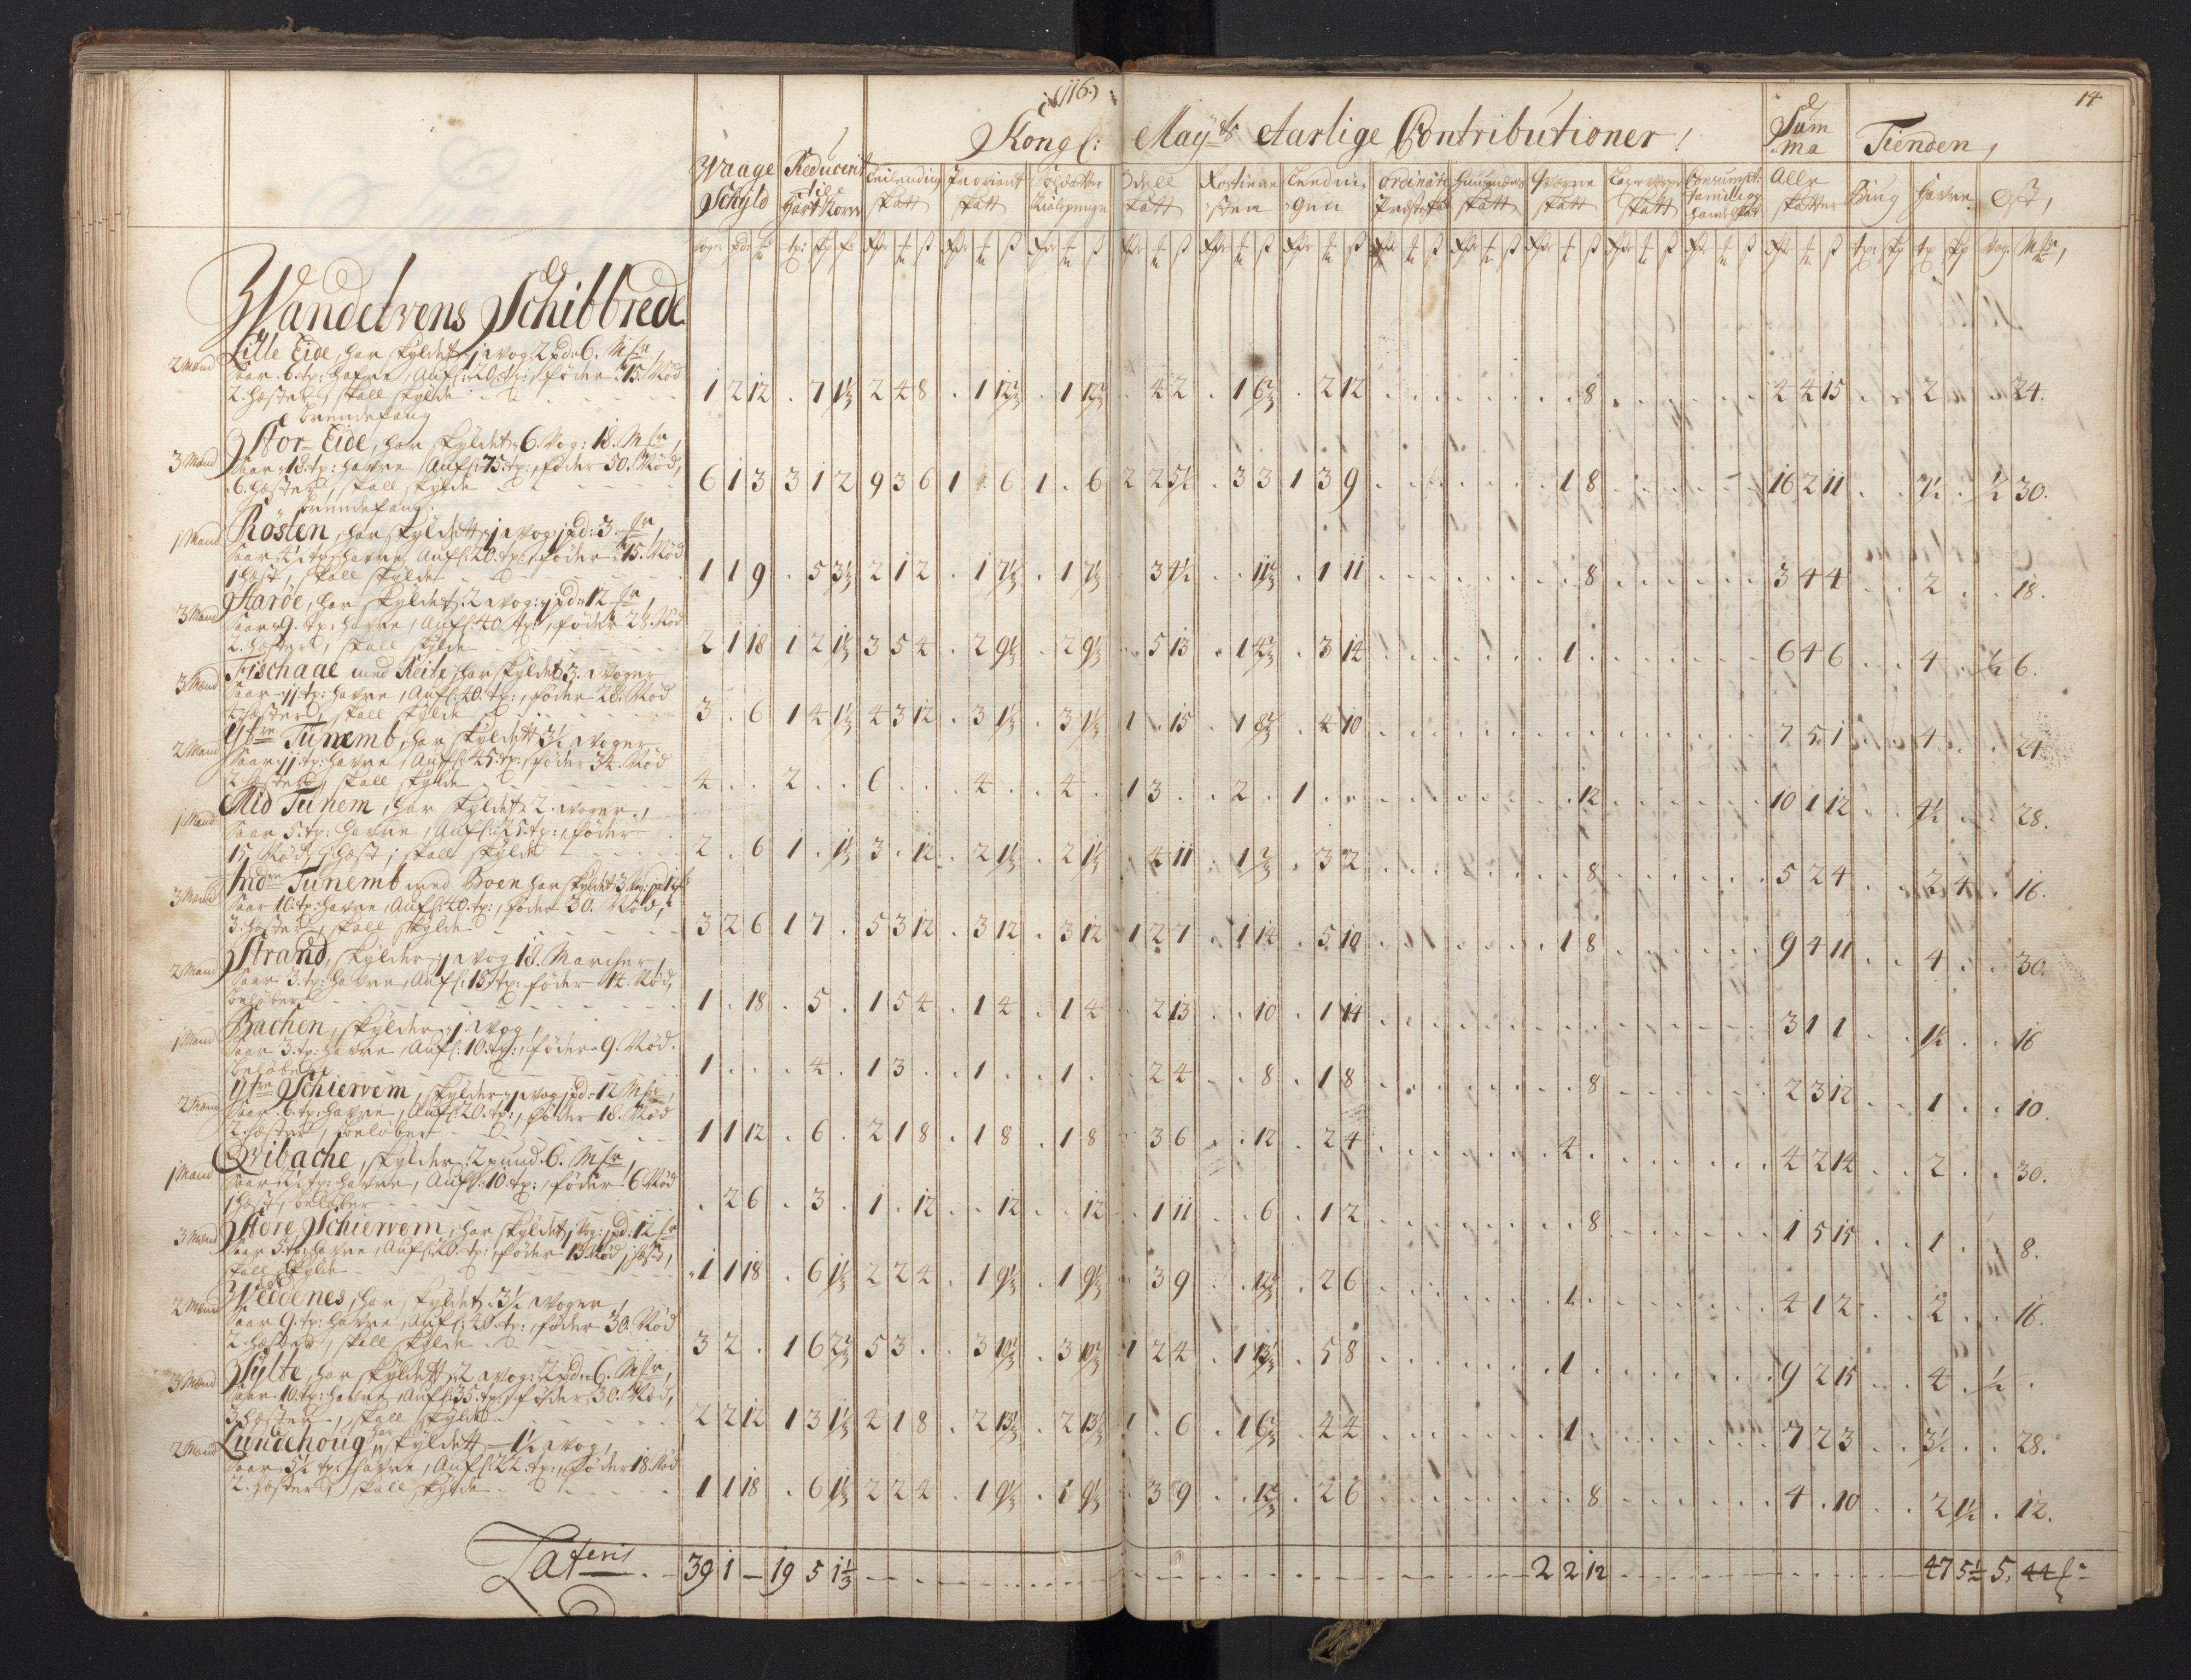 RA, Rentekammeret inntil 1814, Realistisk ordnet avdeling, N/Nb/Nbf/L0149: Sunnmøre, prøvematrikkel, 1714, s. 115b-116a